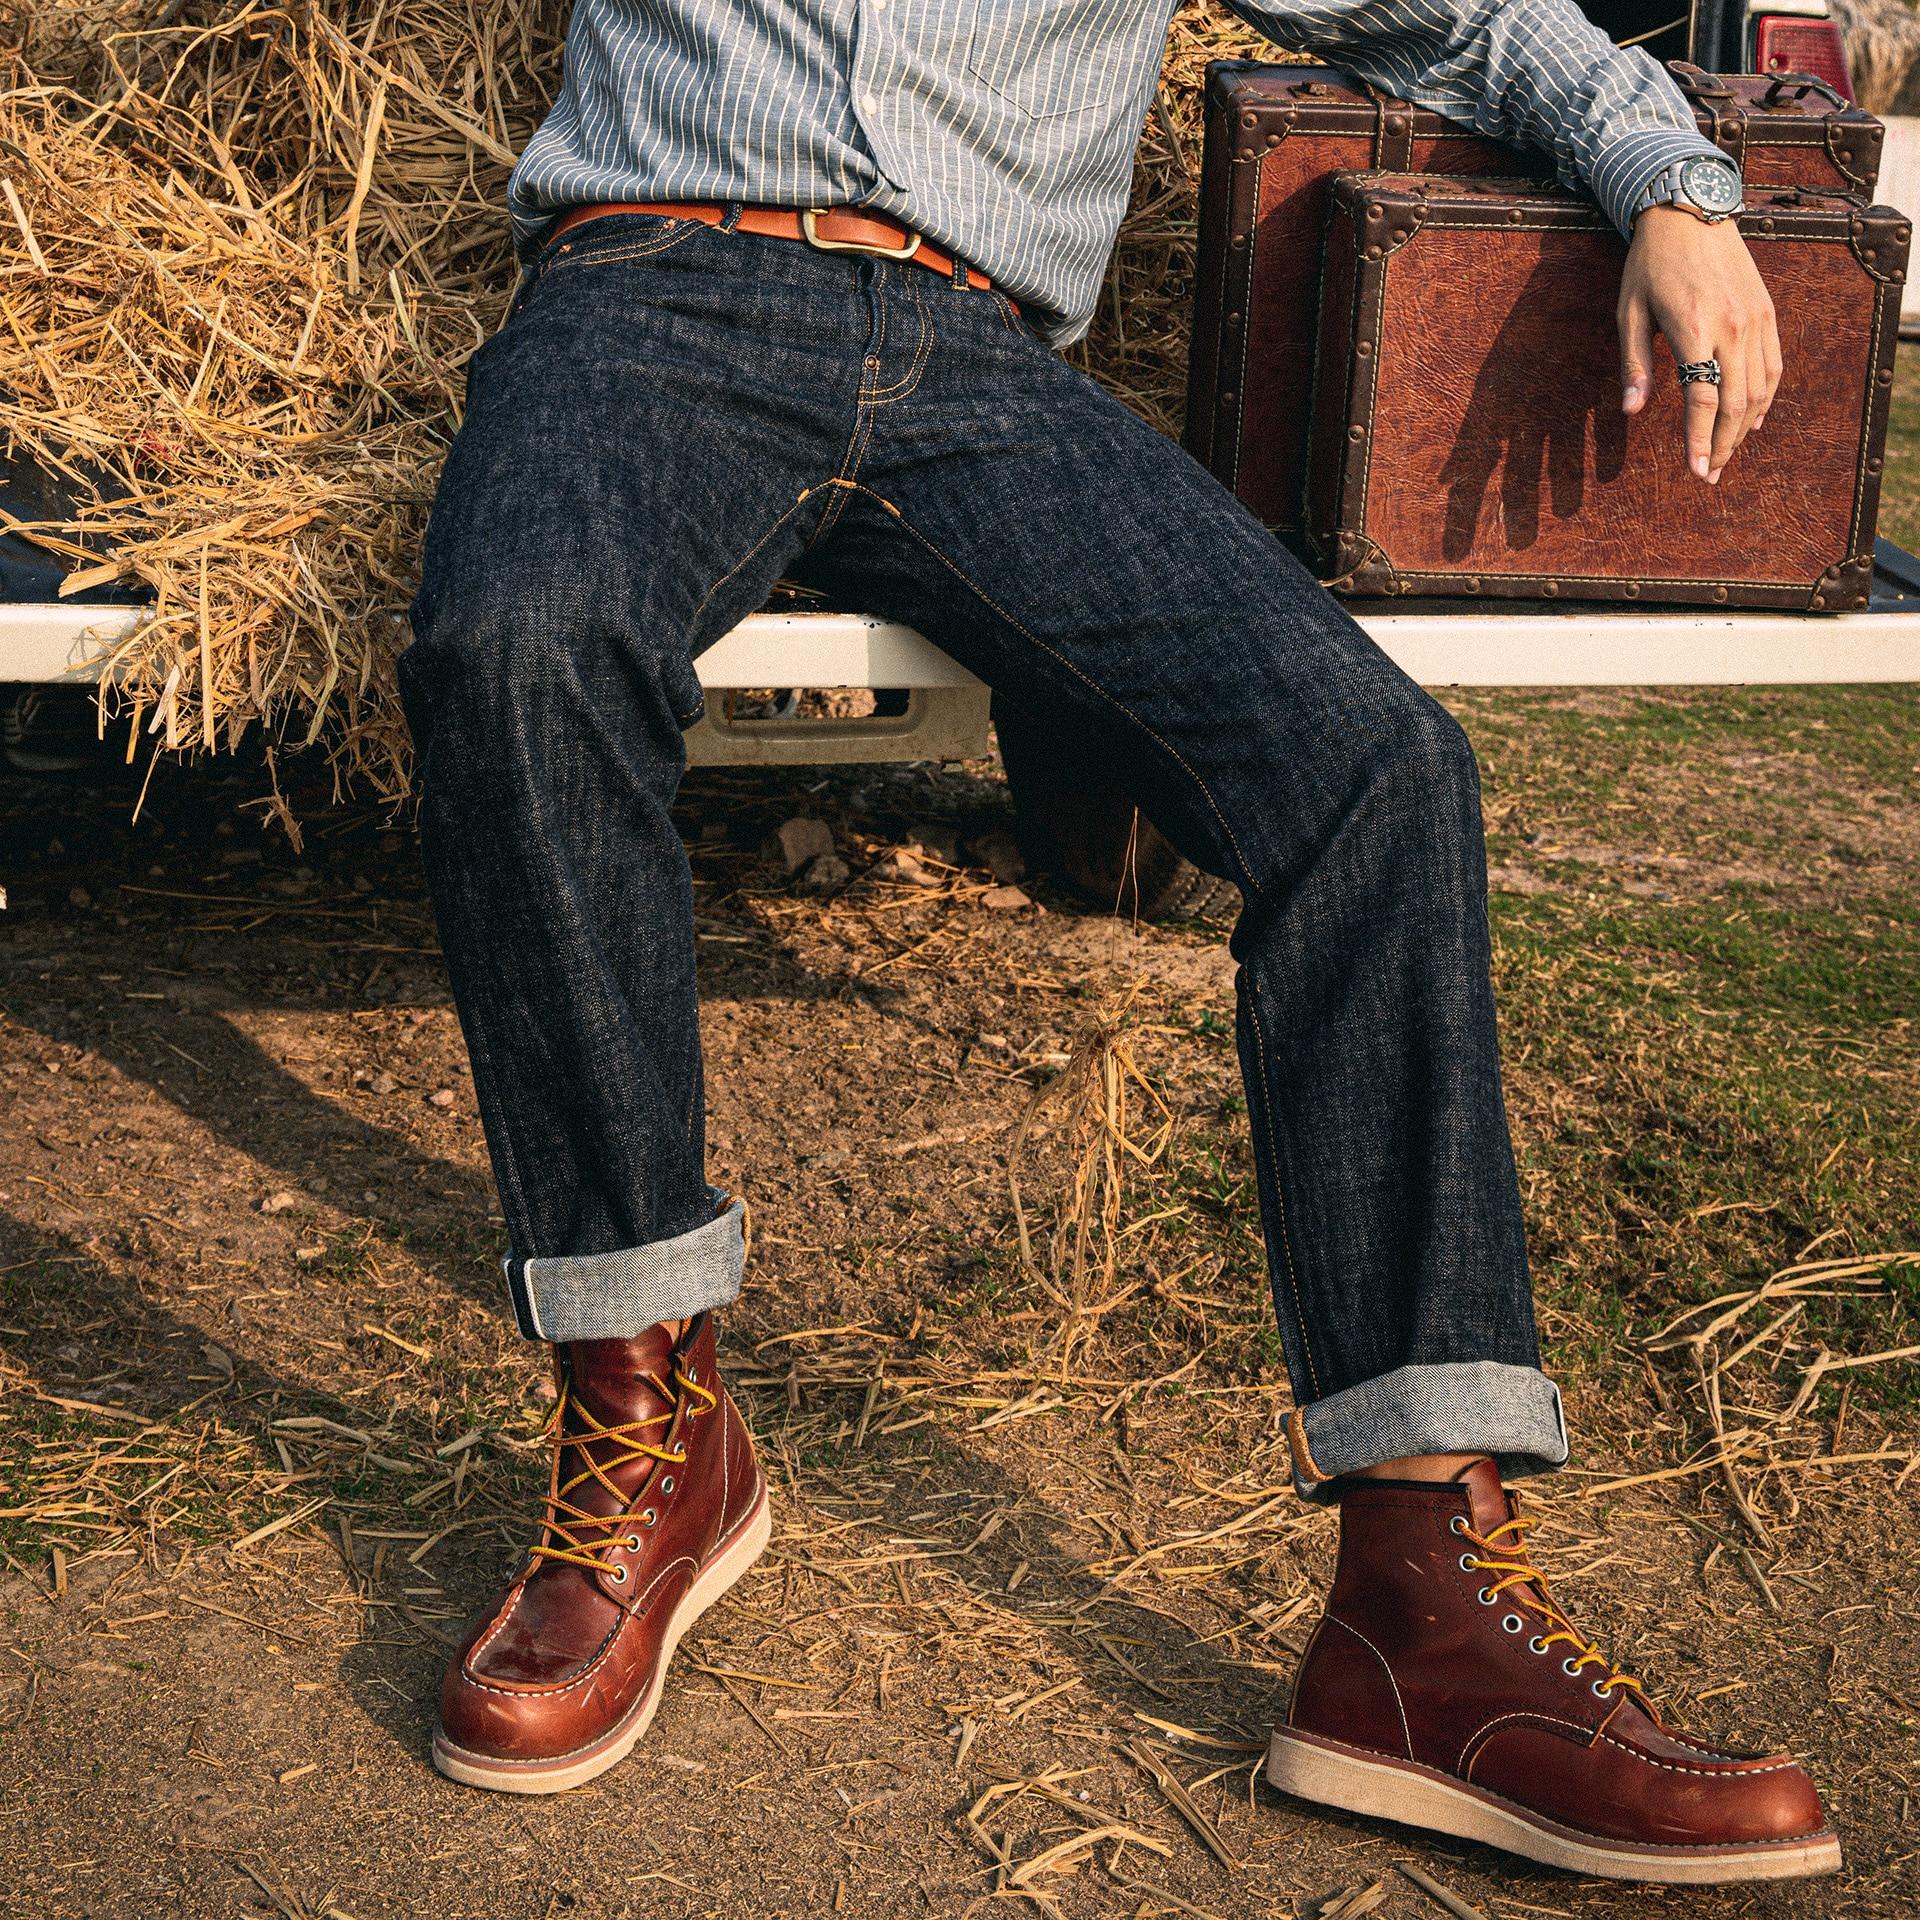 710-0001B Asian Size Read Description High Waist Raw Indigo Selvage Washed 14oz Denim Jeans Sanforised Pants